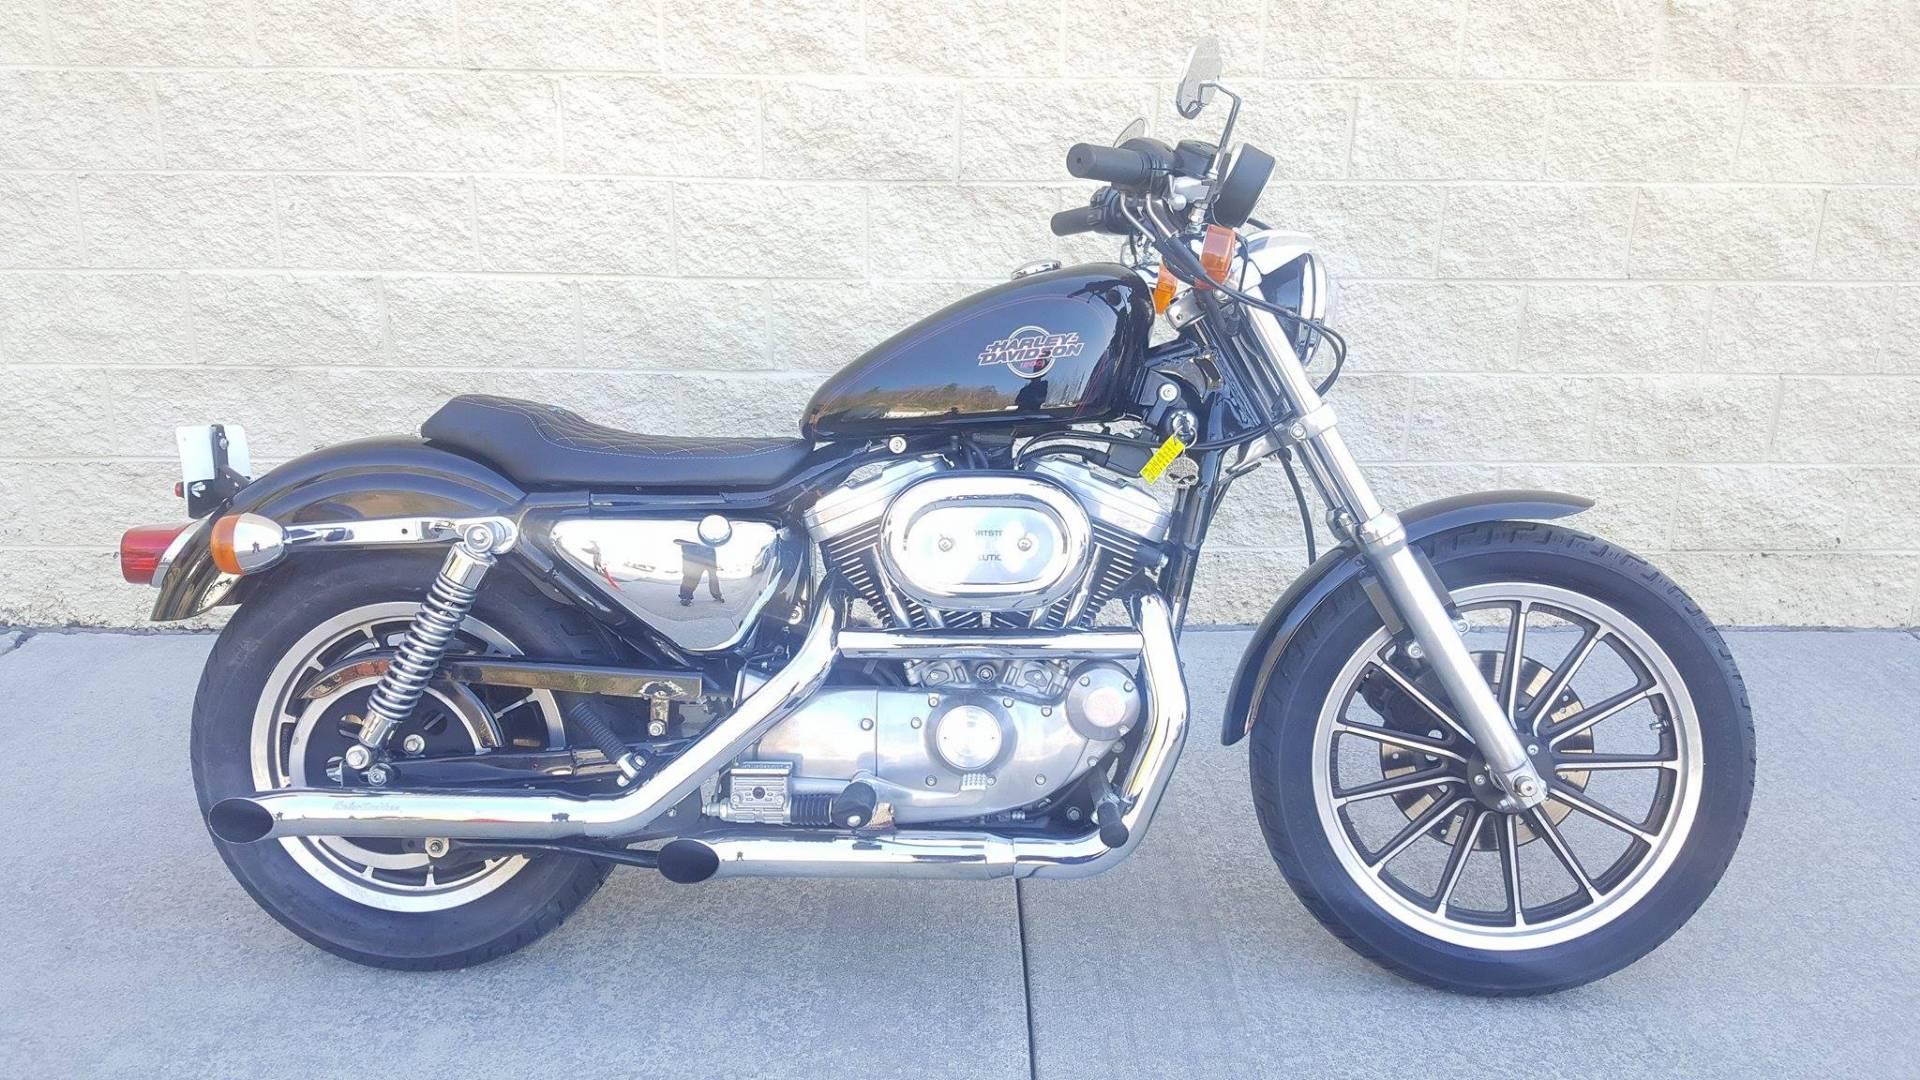 1999 Harley-Davidson XL 1200S Sportster 1200 Sport